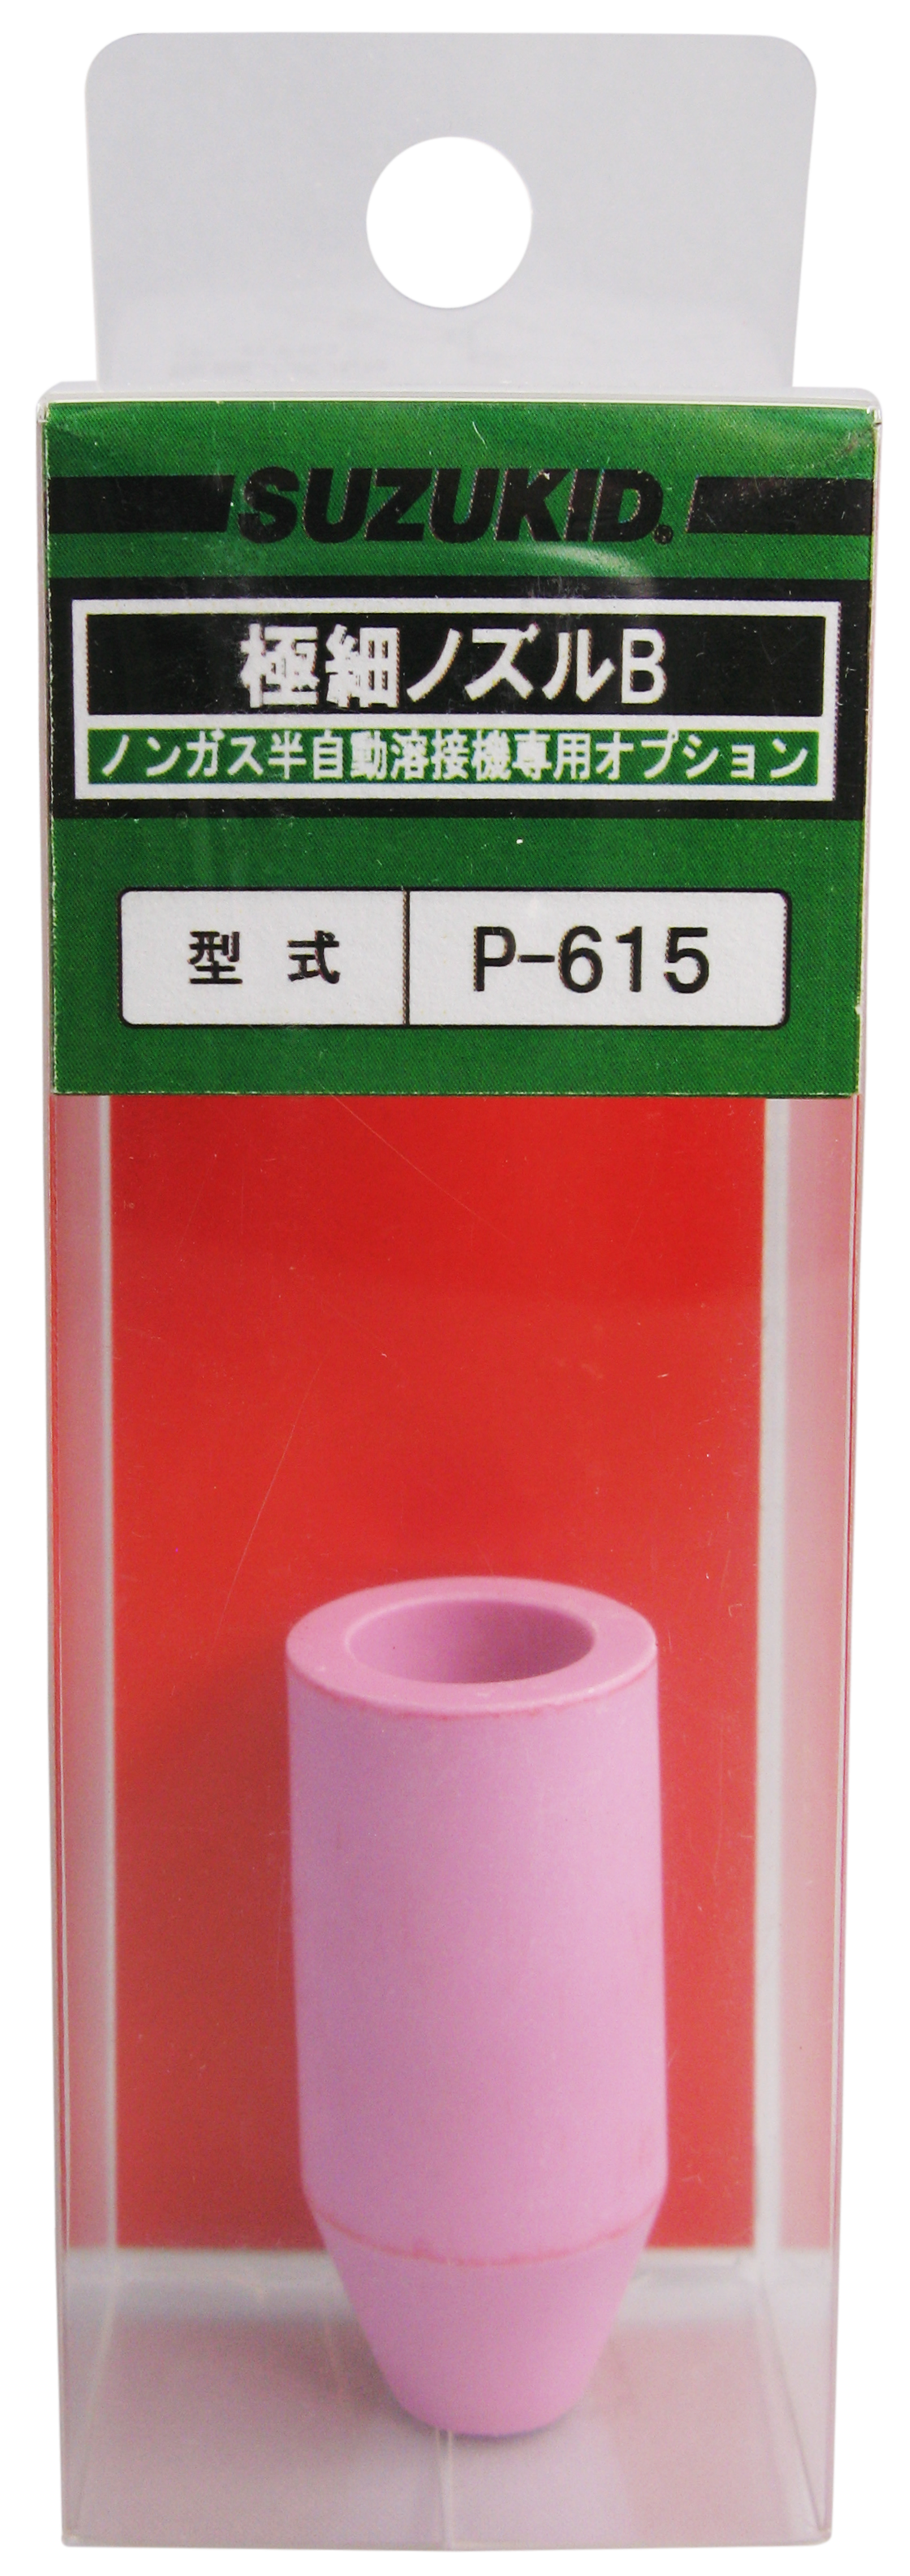 P-615